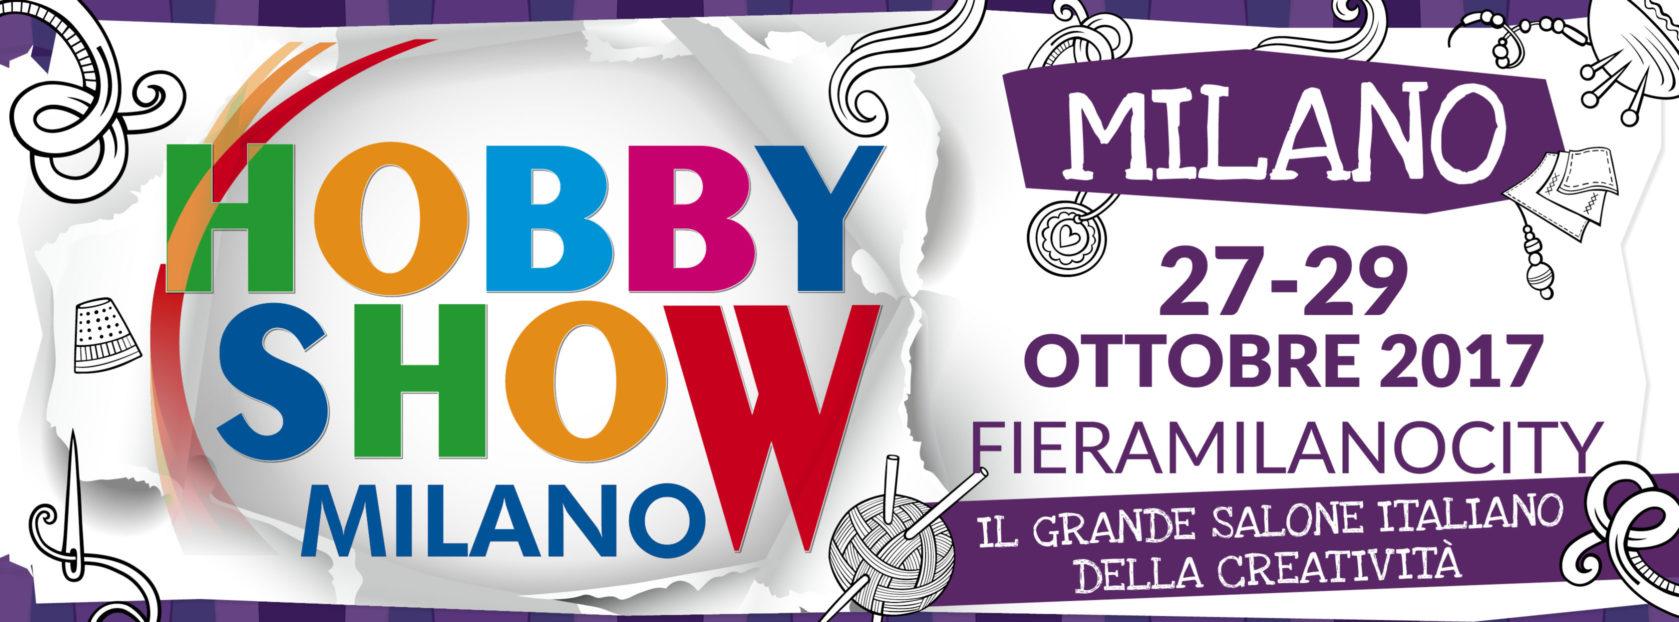 HOBBYSHOW di Milano